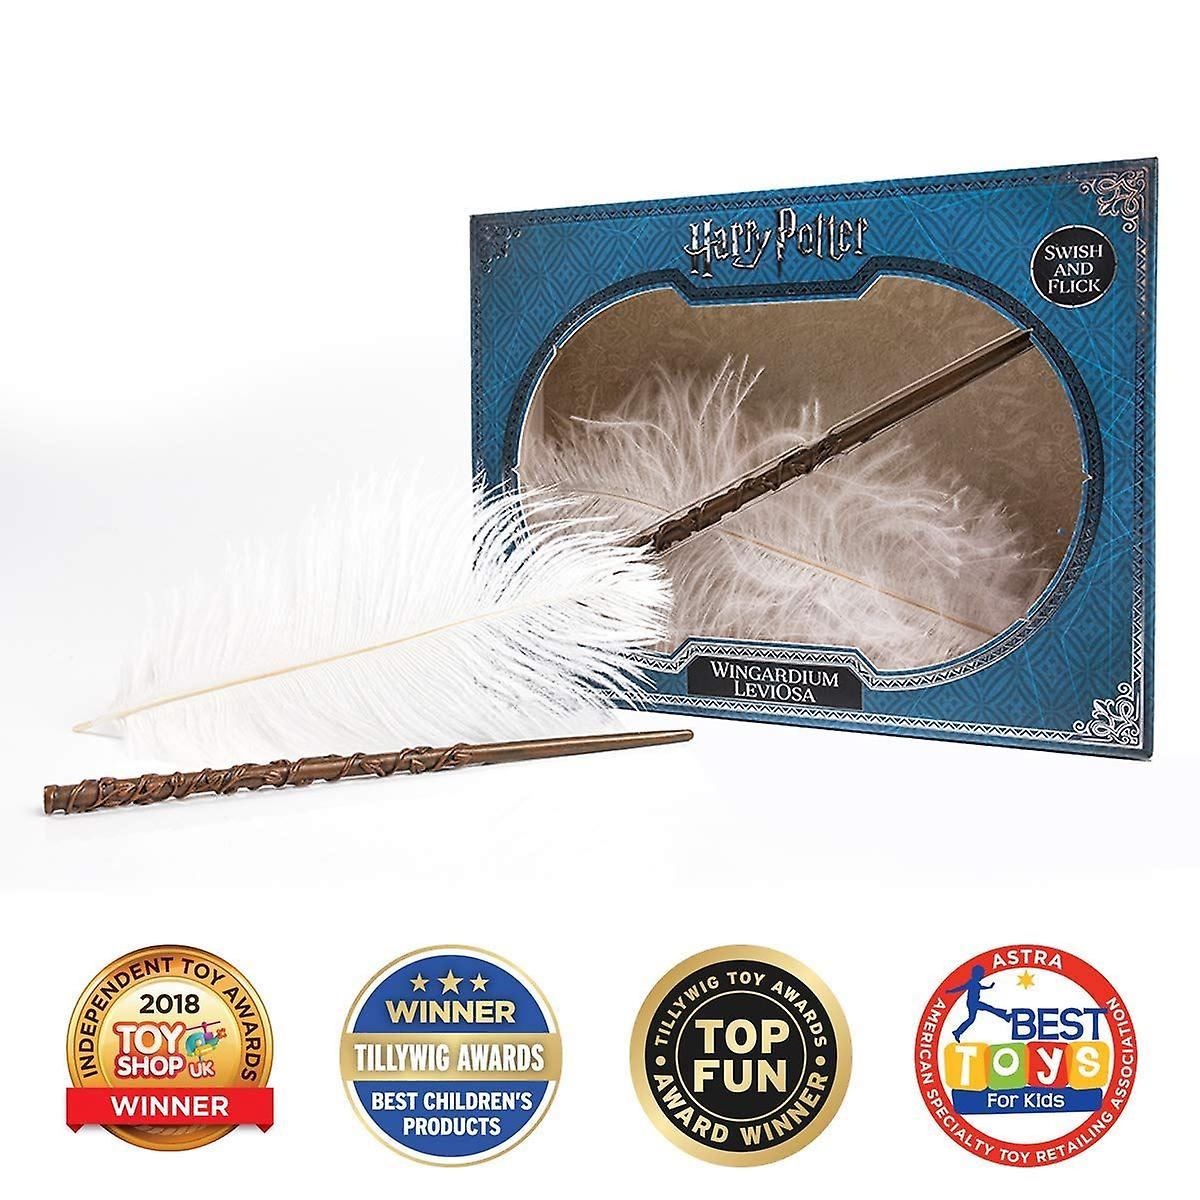 JK Rowling's Wizarding World Wingardium Leviosa Kit